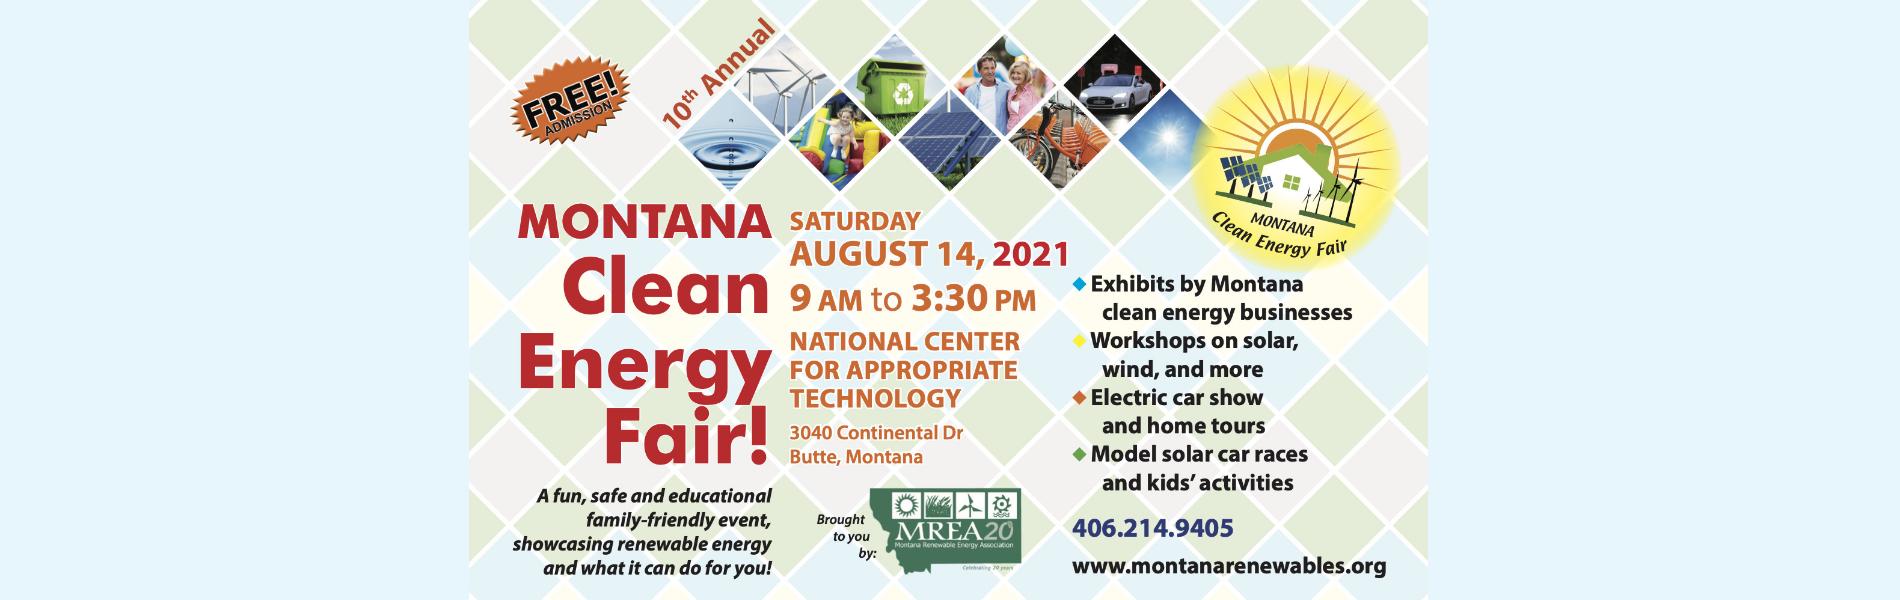 Clean Energy Fair 2021